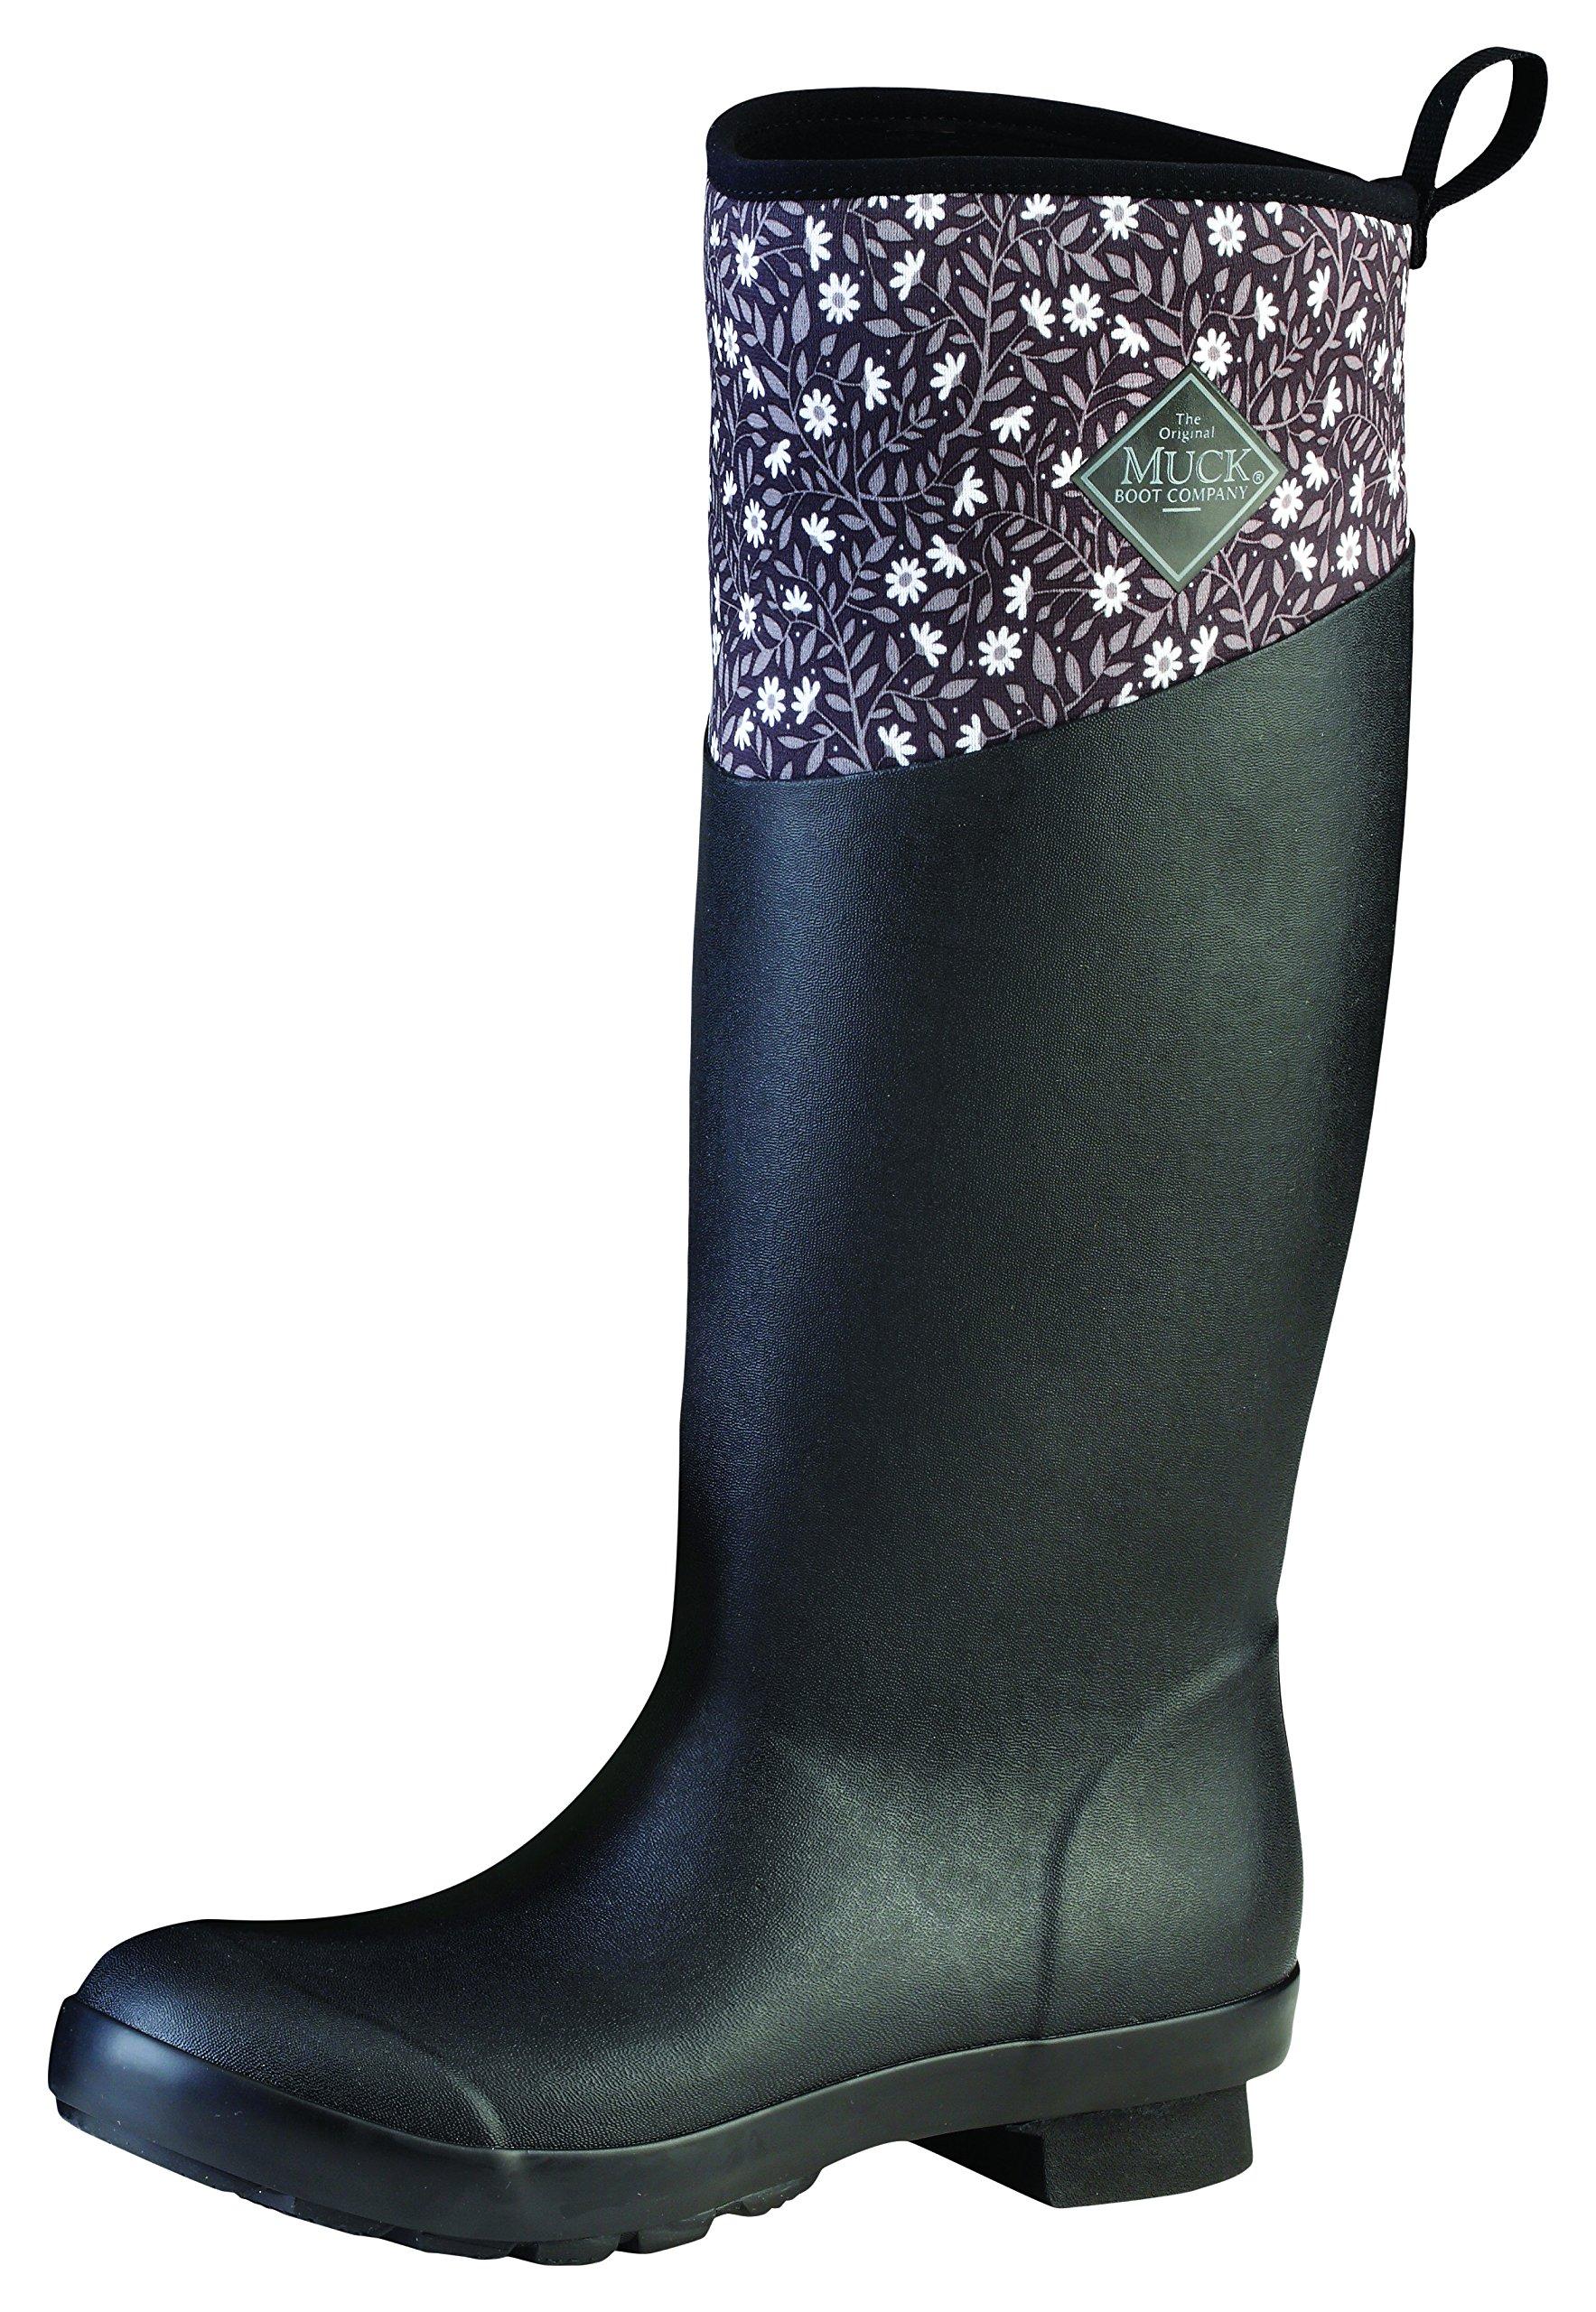 FemmeNoirblack TallPrintBottesamp; 40 Tremont Pluie Boots Eu De Wellie Muck Matte Bottines castlerock Gray39 lK1JTc3F